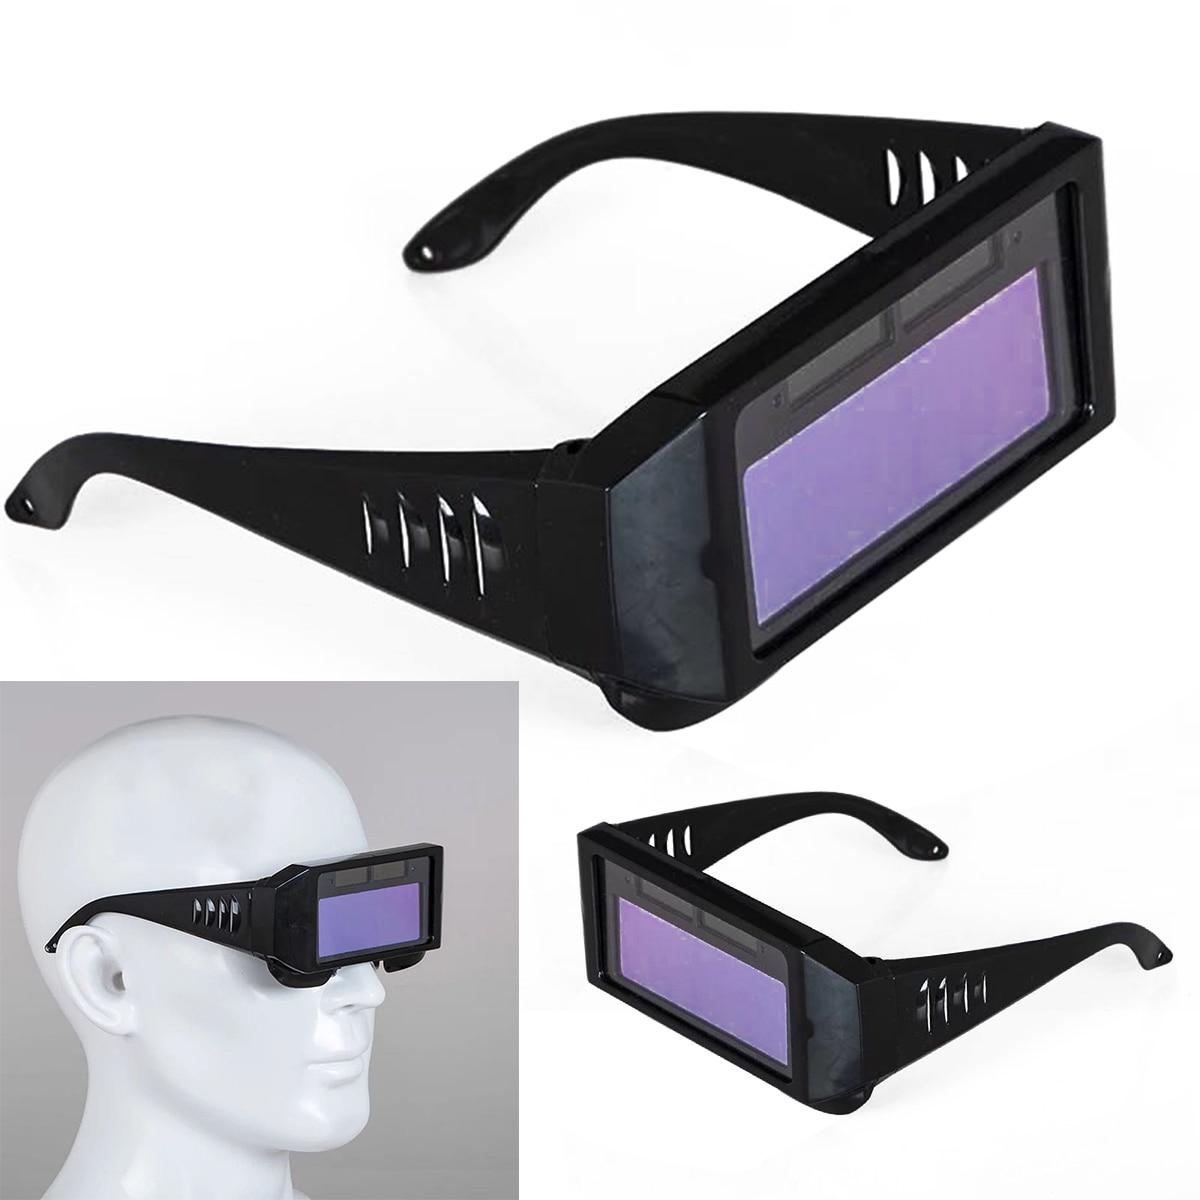 New Solar Auto Darkening Welding Glasses Welding Mask Helmet Eyes Goggle Welder Glasses Arc Welding Tool Accessories